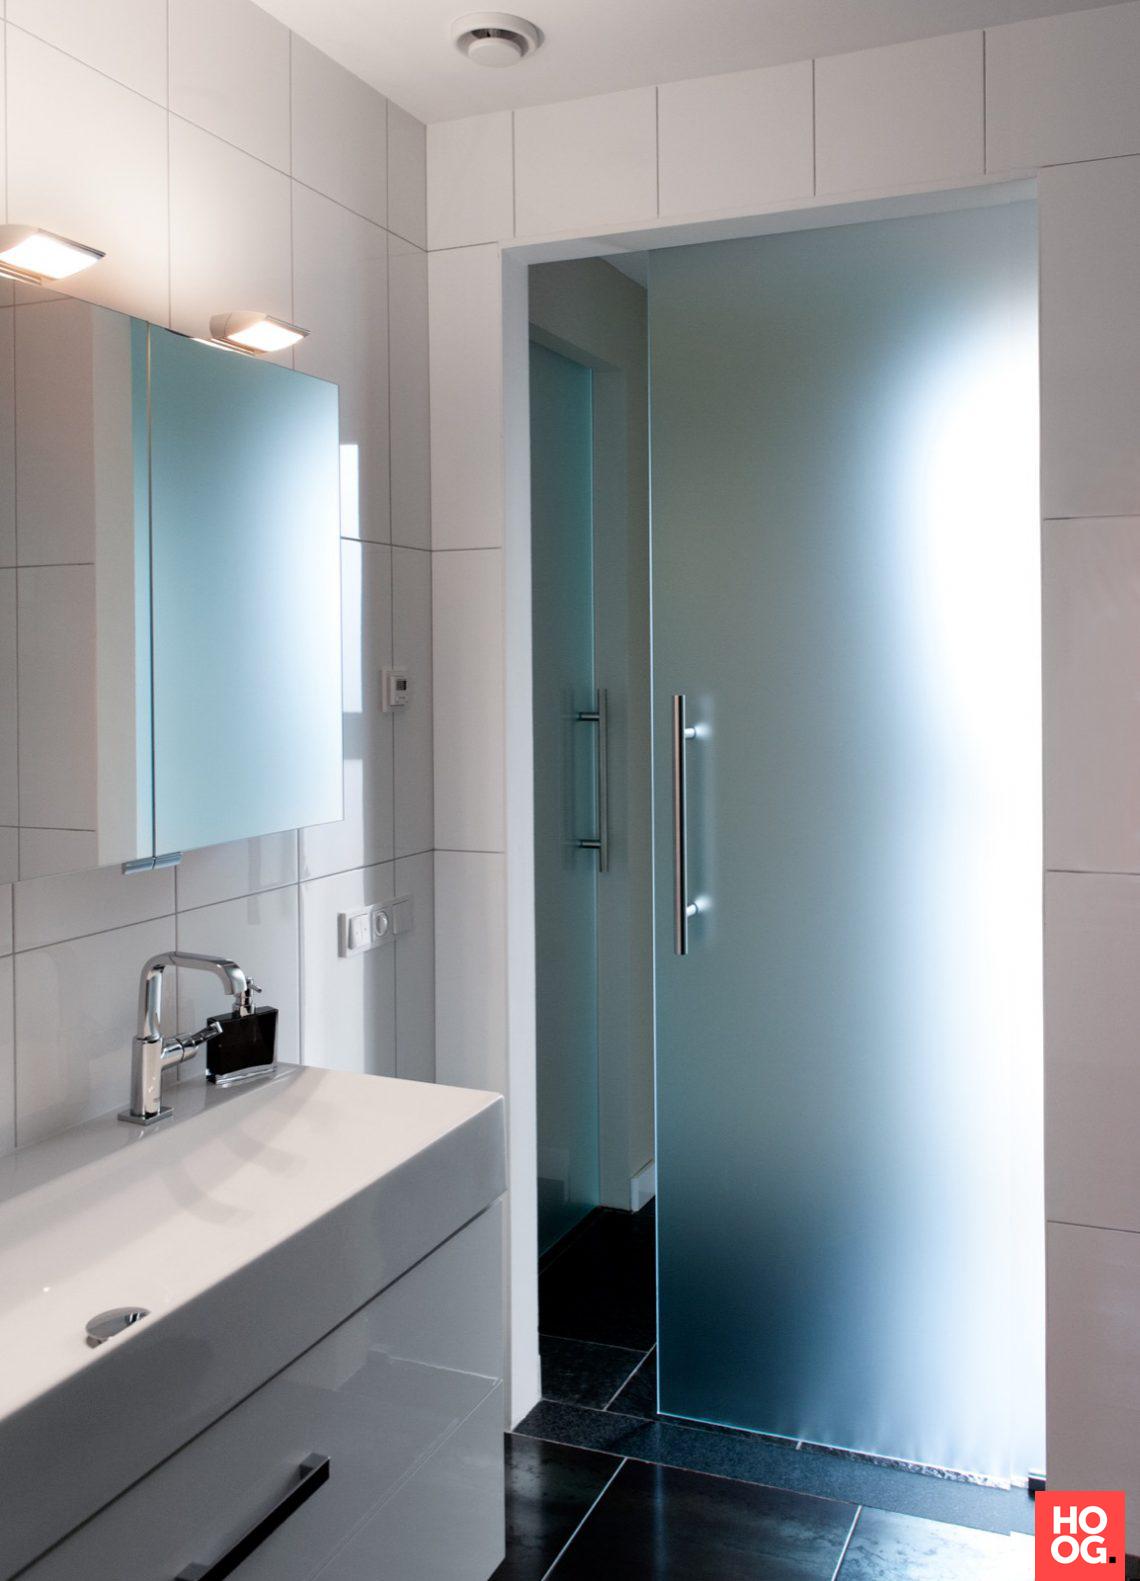 Wenthec Glas - Badkamer met glazen deur - Hoog □ Exclusieve woon ...